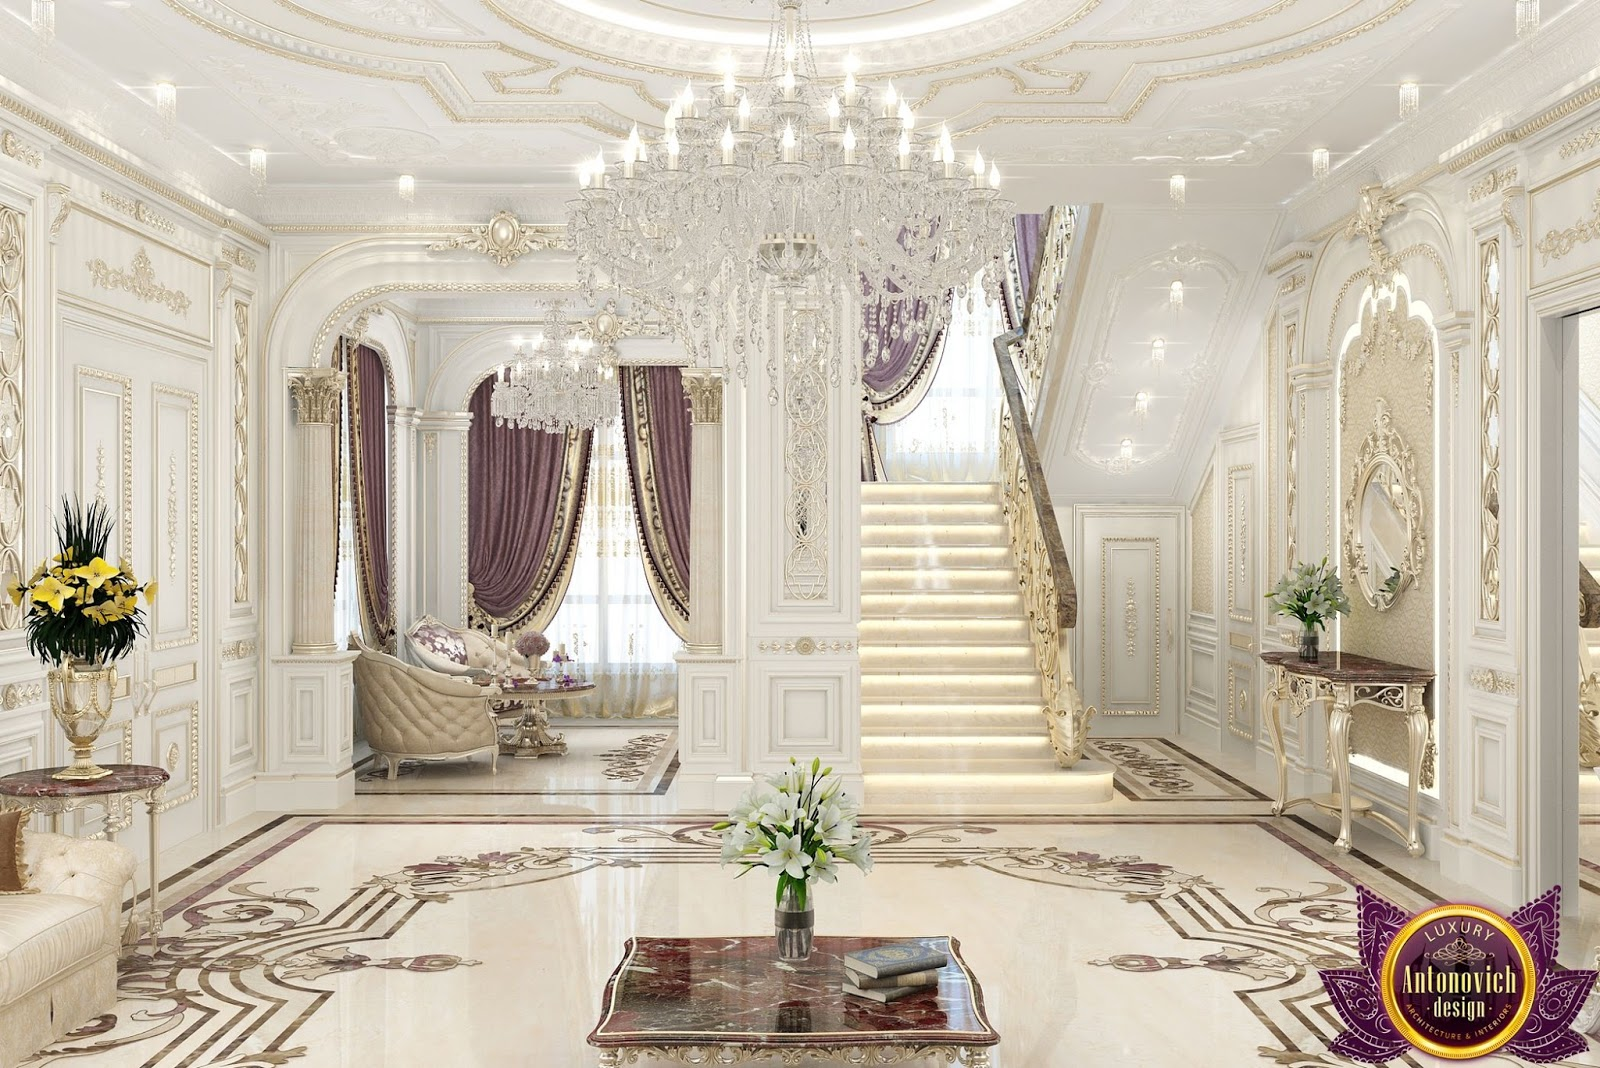 LUXURY ANTONOVICH DESIGN UAE: Most beautiful house Interiors from ...